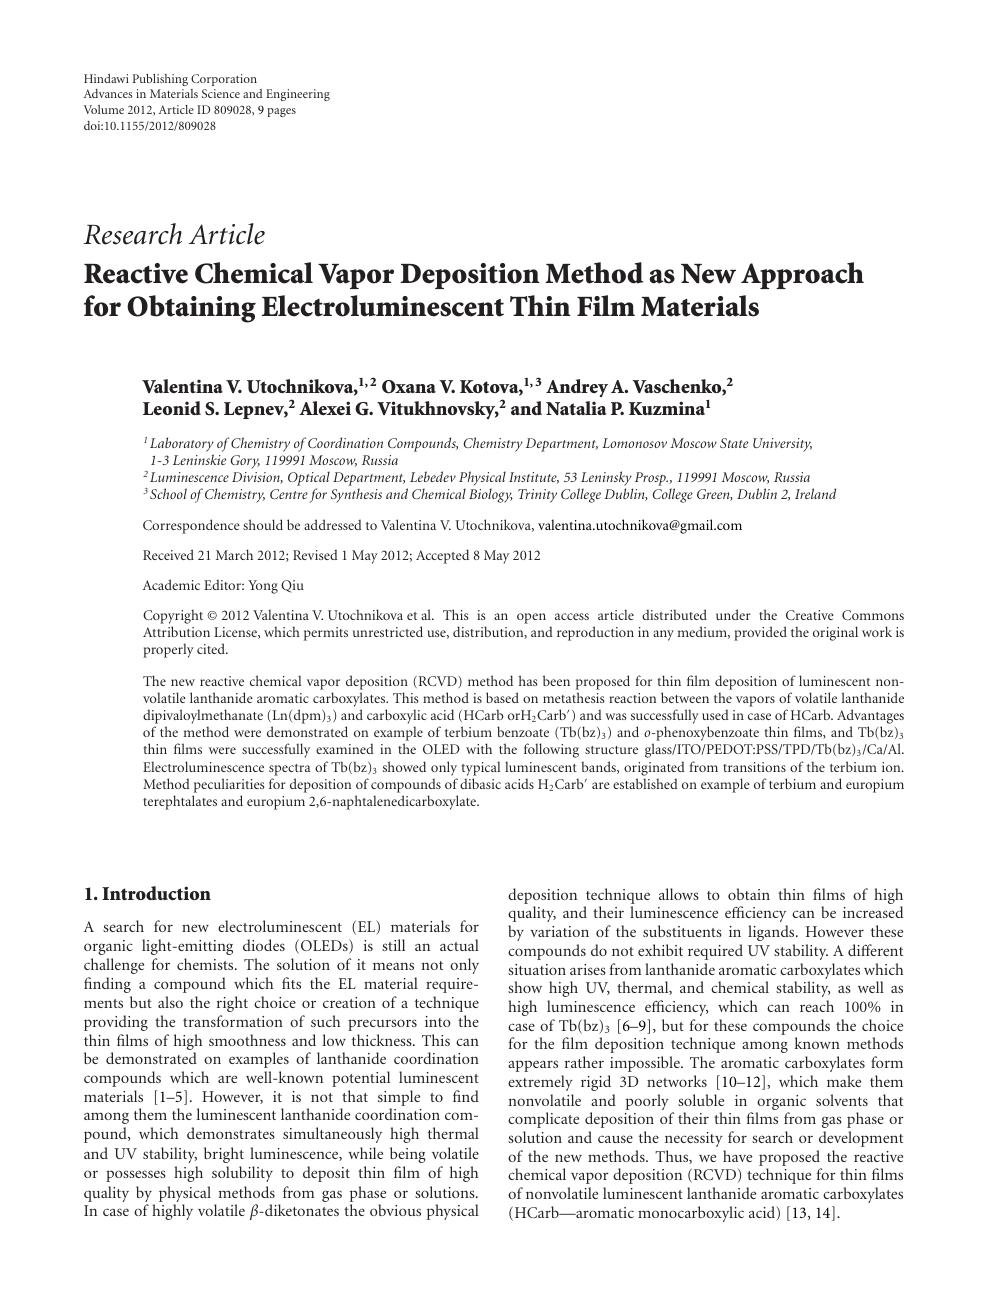 Reactive Chemical Vapor Deposition Method as New Approach